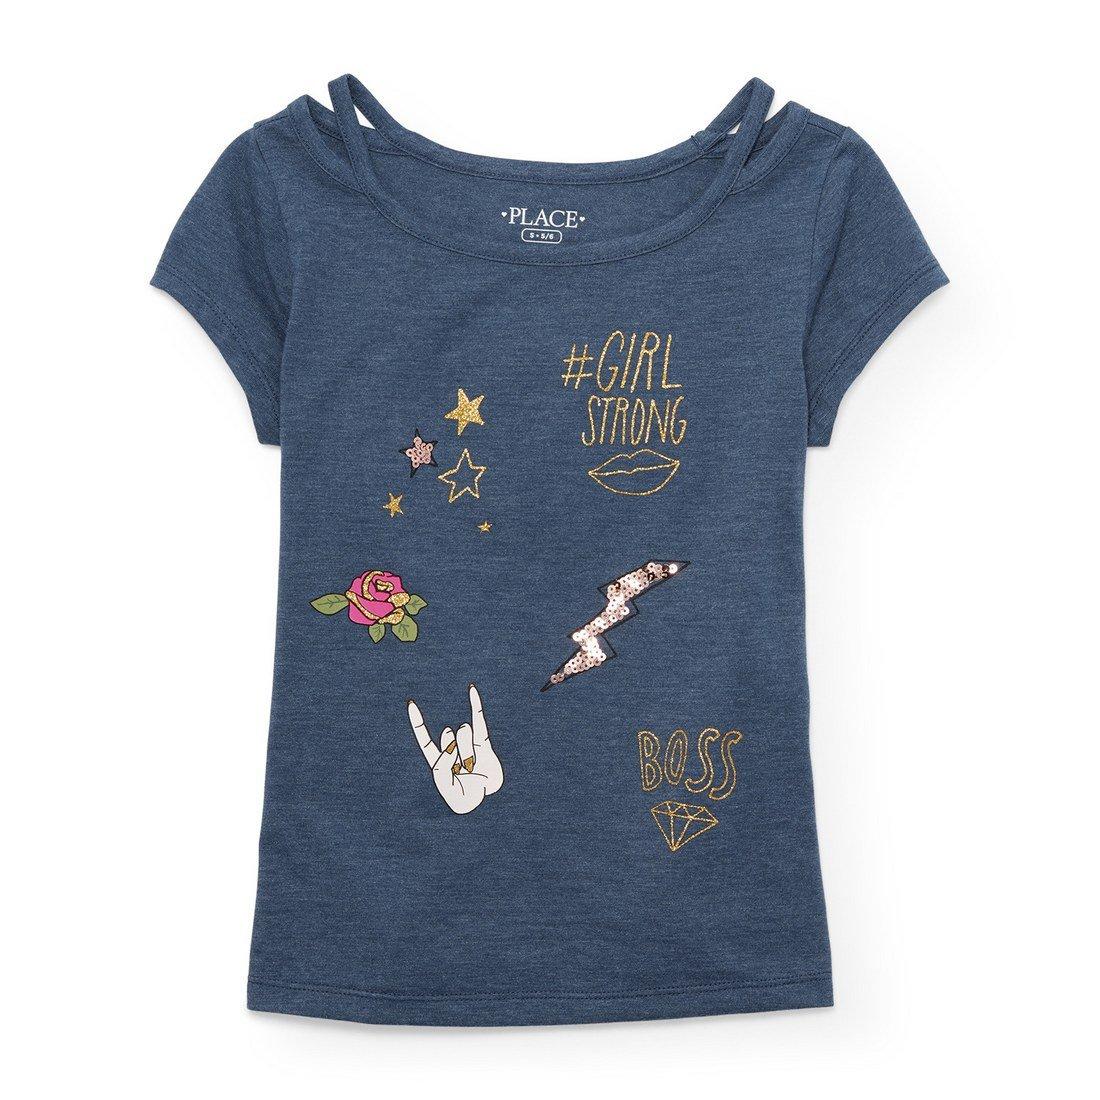 The Children's Place Big Girls' Short Sleeve Fashion Top, Mystic Falls 4215, M (7/8)